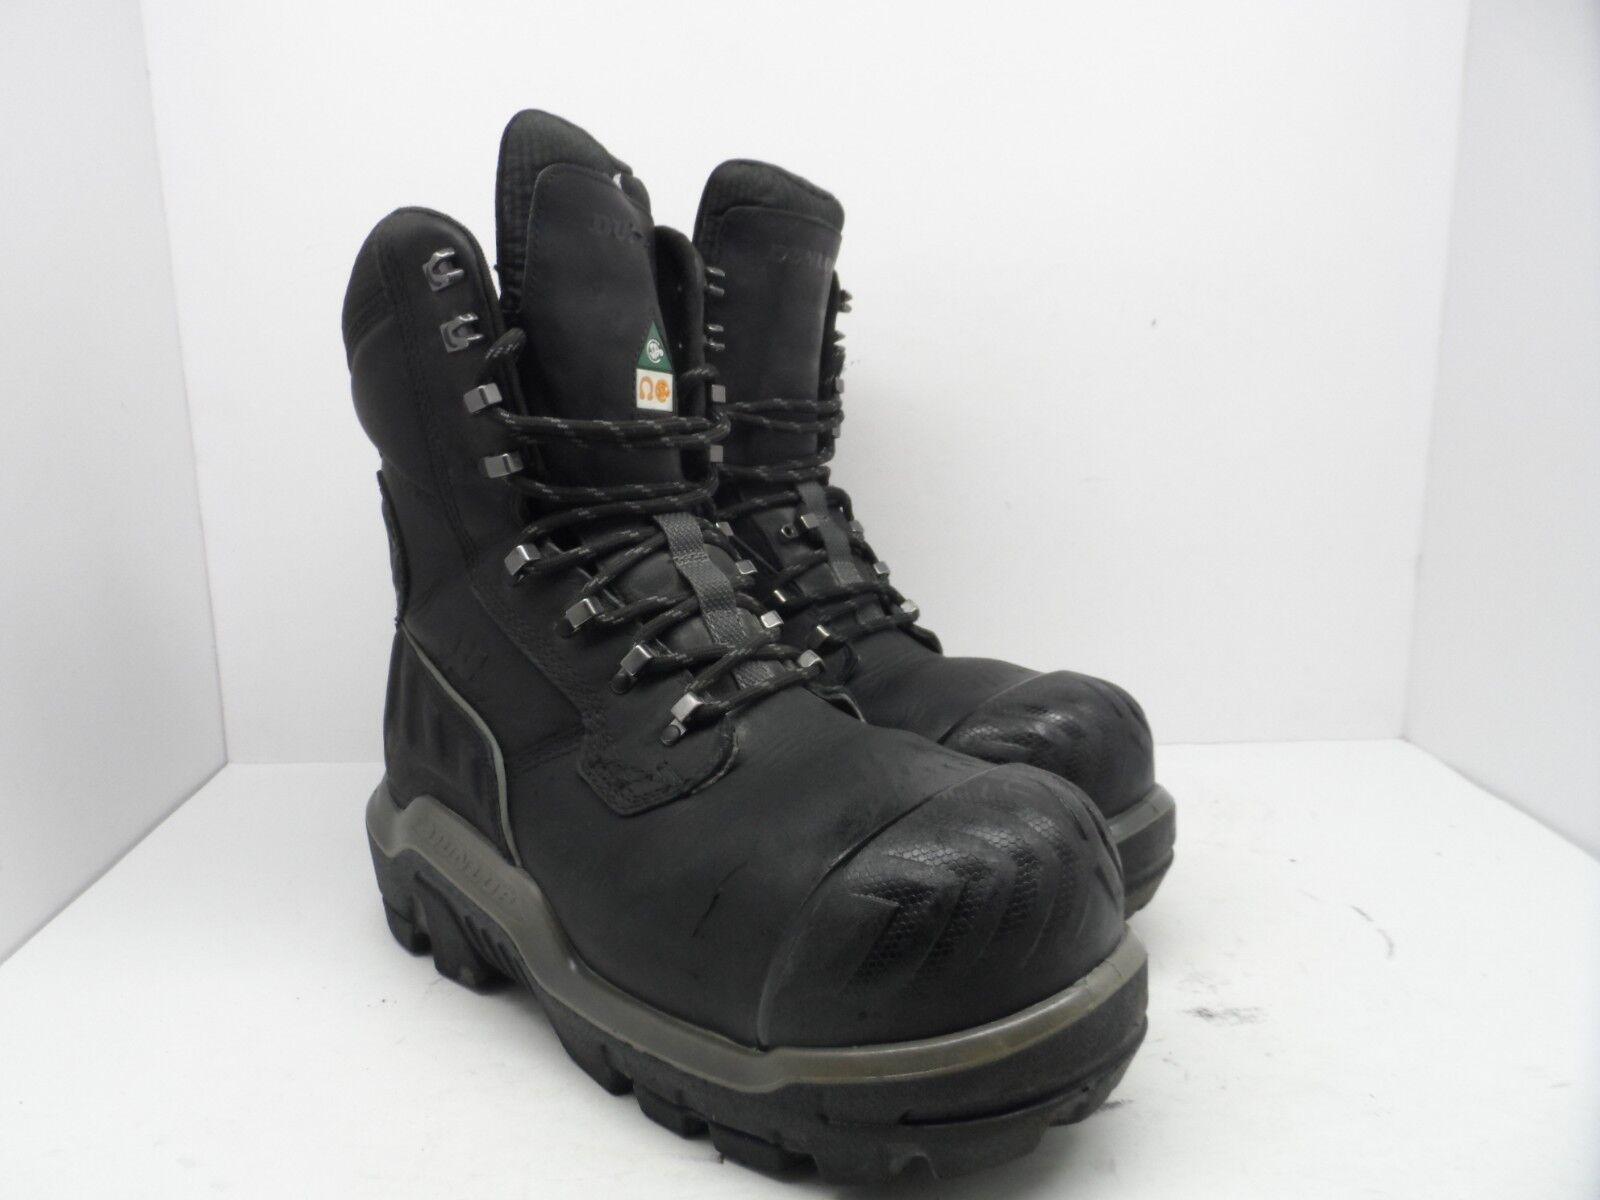 Dunlop Men's 8'' Composite Toe Composite Plate WP Leather Work Boots Black 10.5M